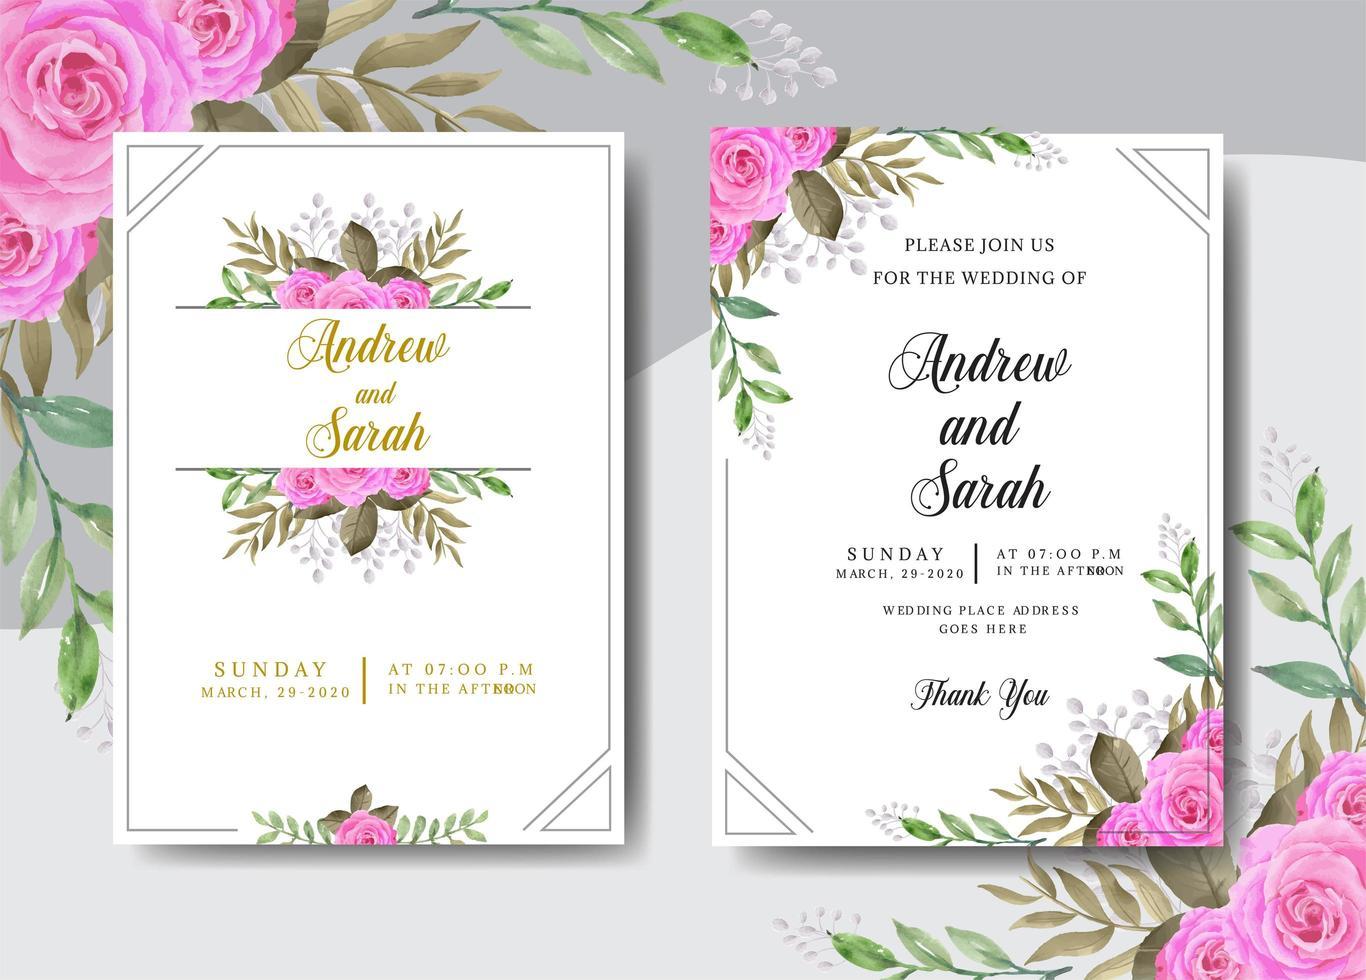 invitación de boda acuarela con marco vector